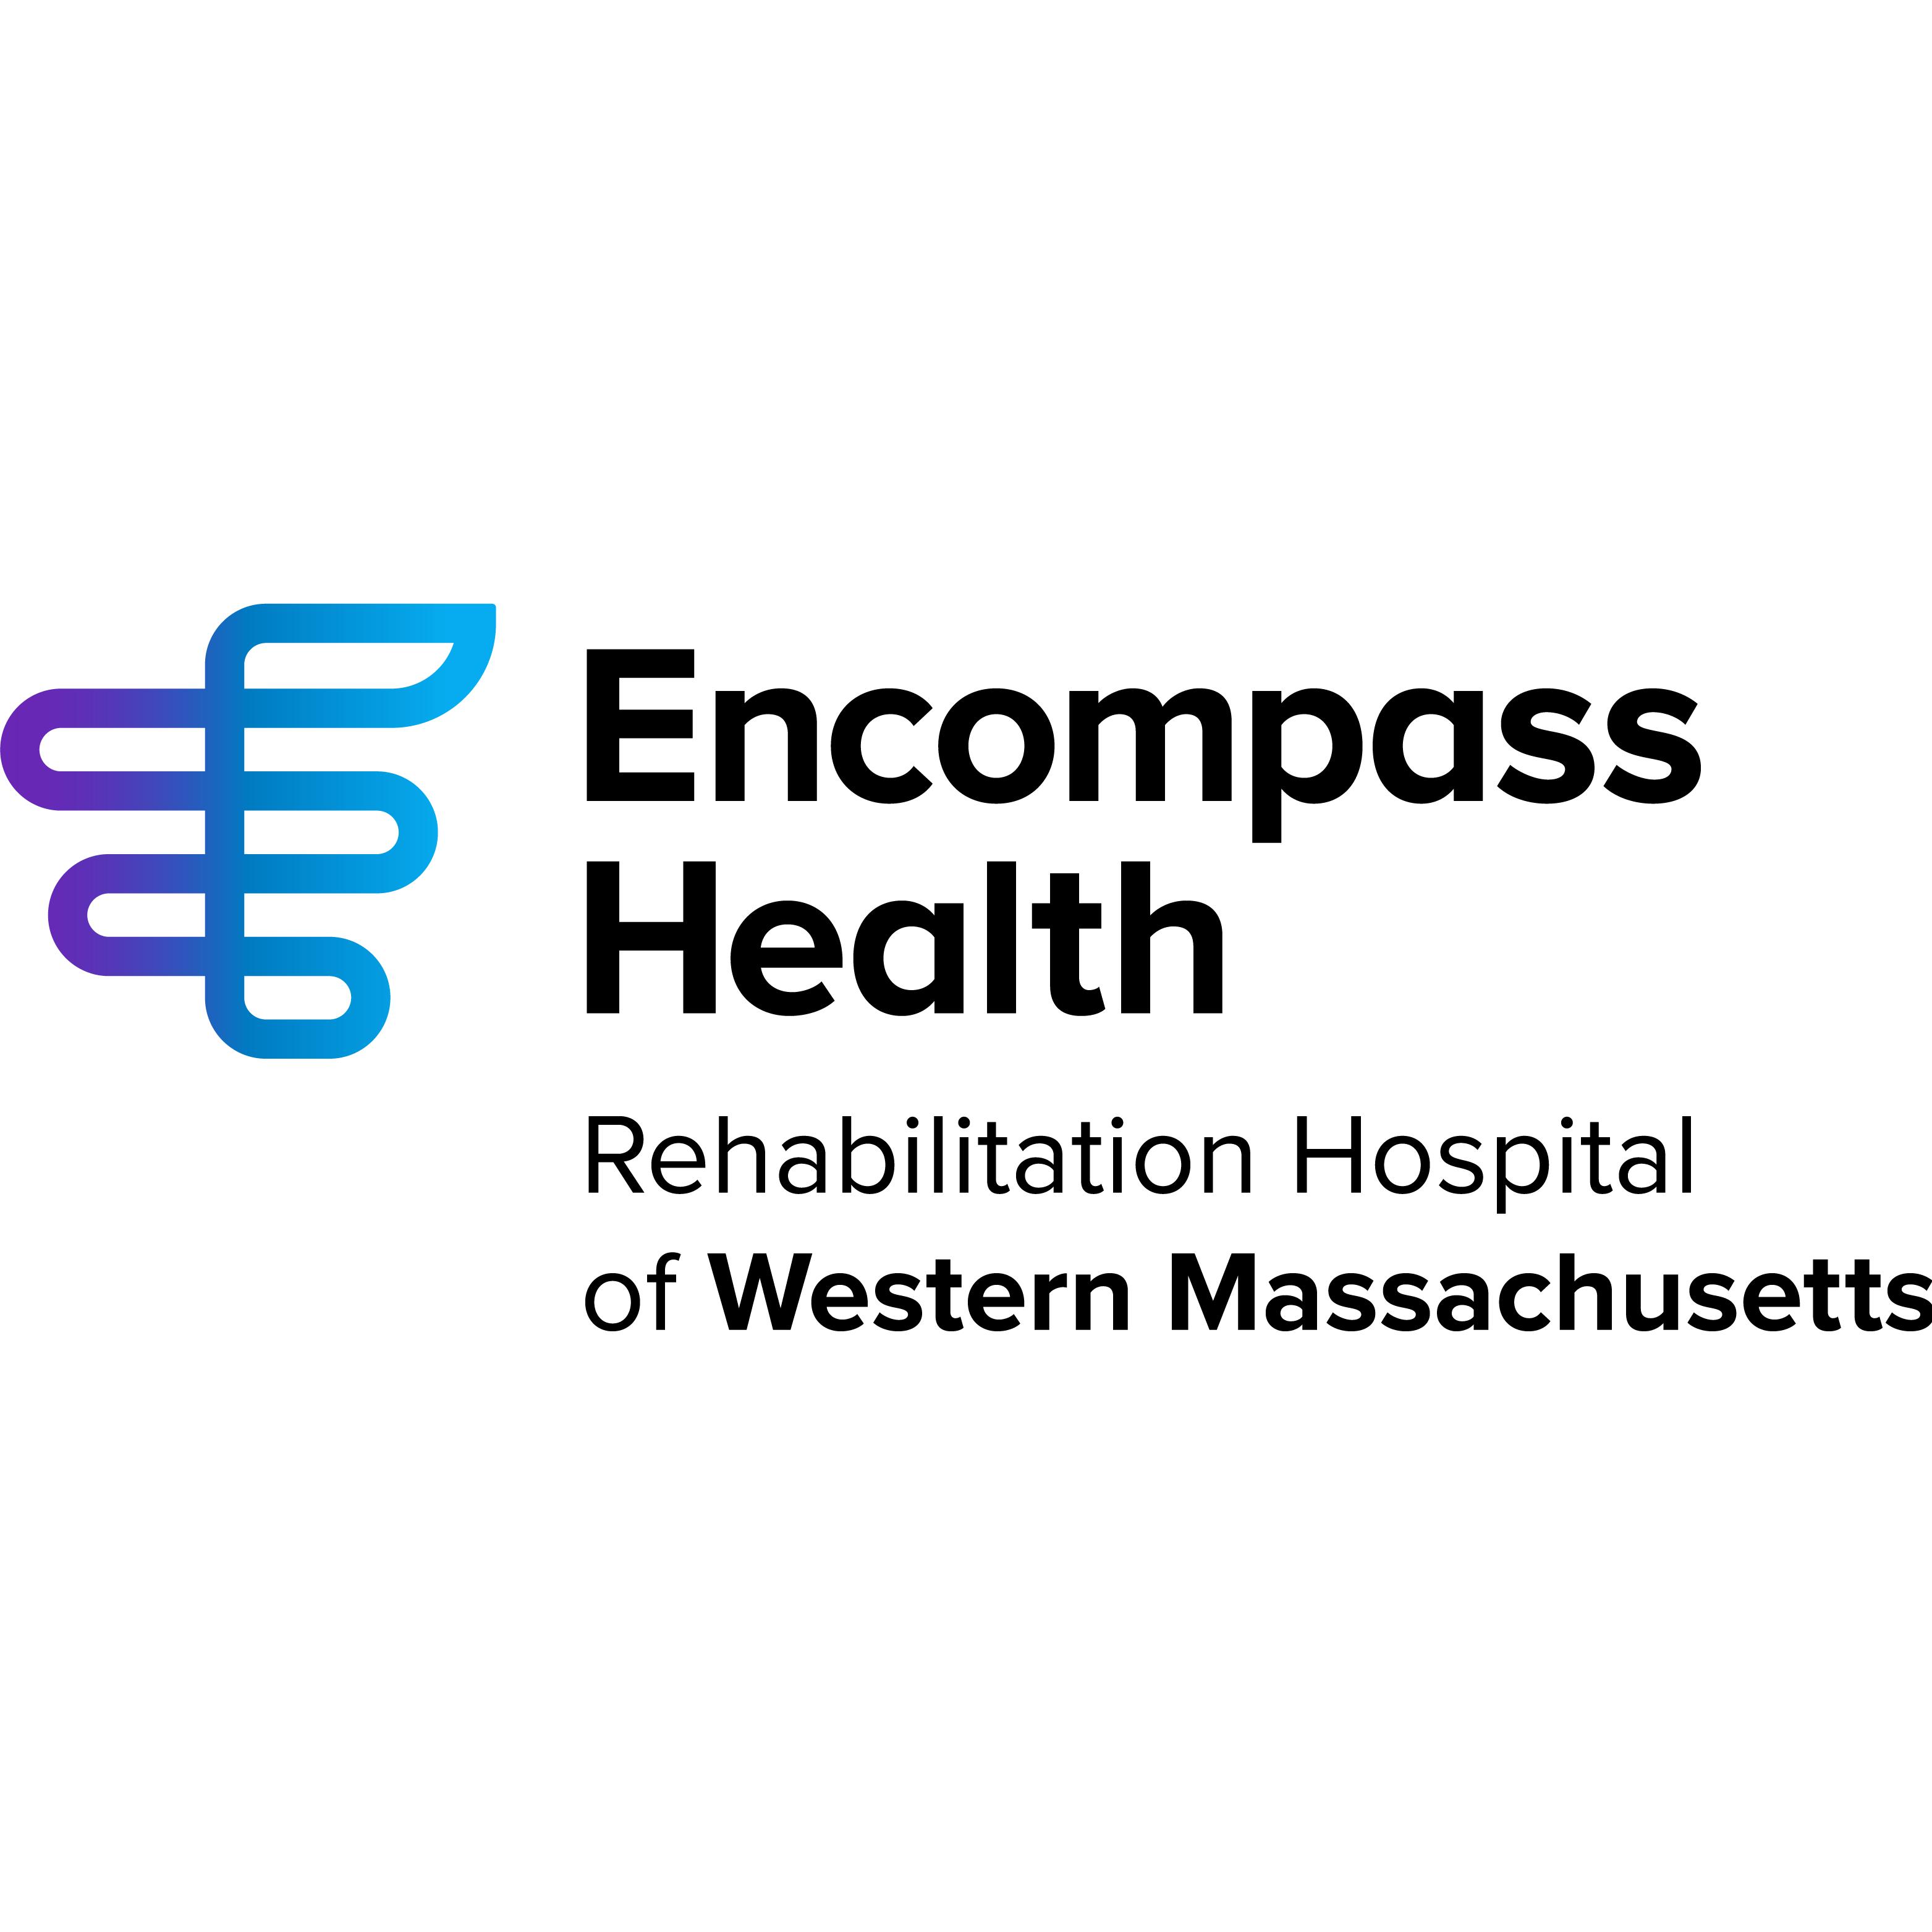 Encompass Health Rehabilitation Hospital of Western Massachusetts